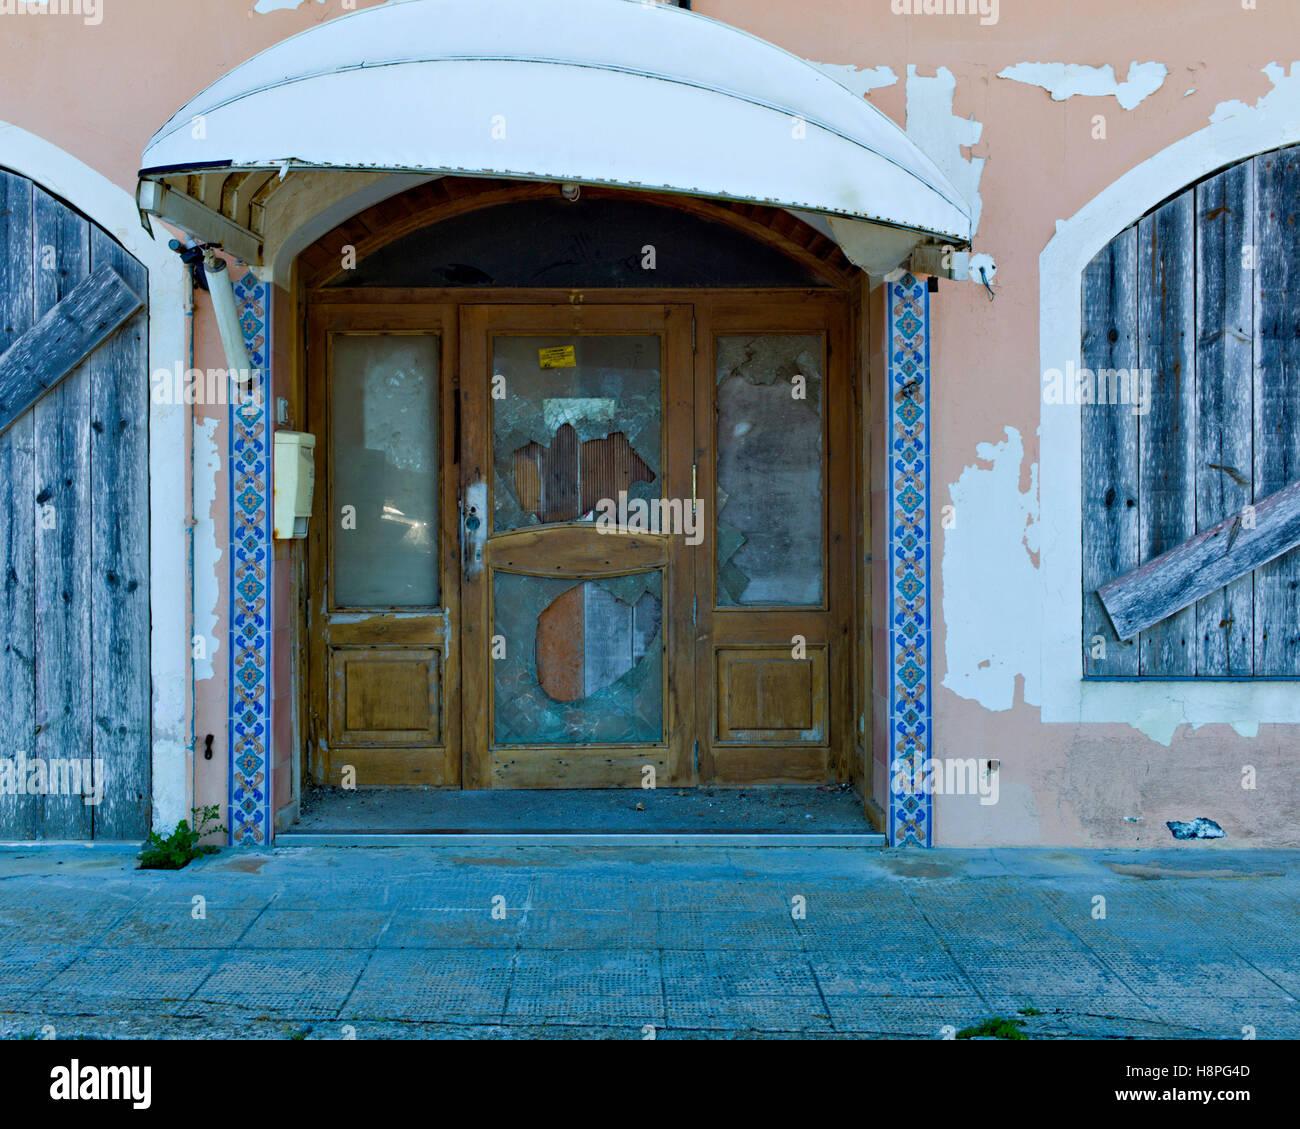 The derelict Hostel Miramar on Carrer Moll del Fonduco Mahon Menorca Spain - Stock Image